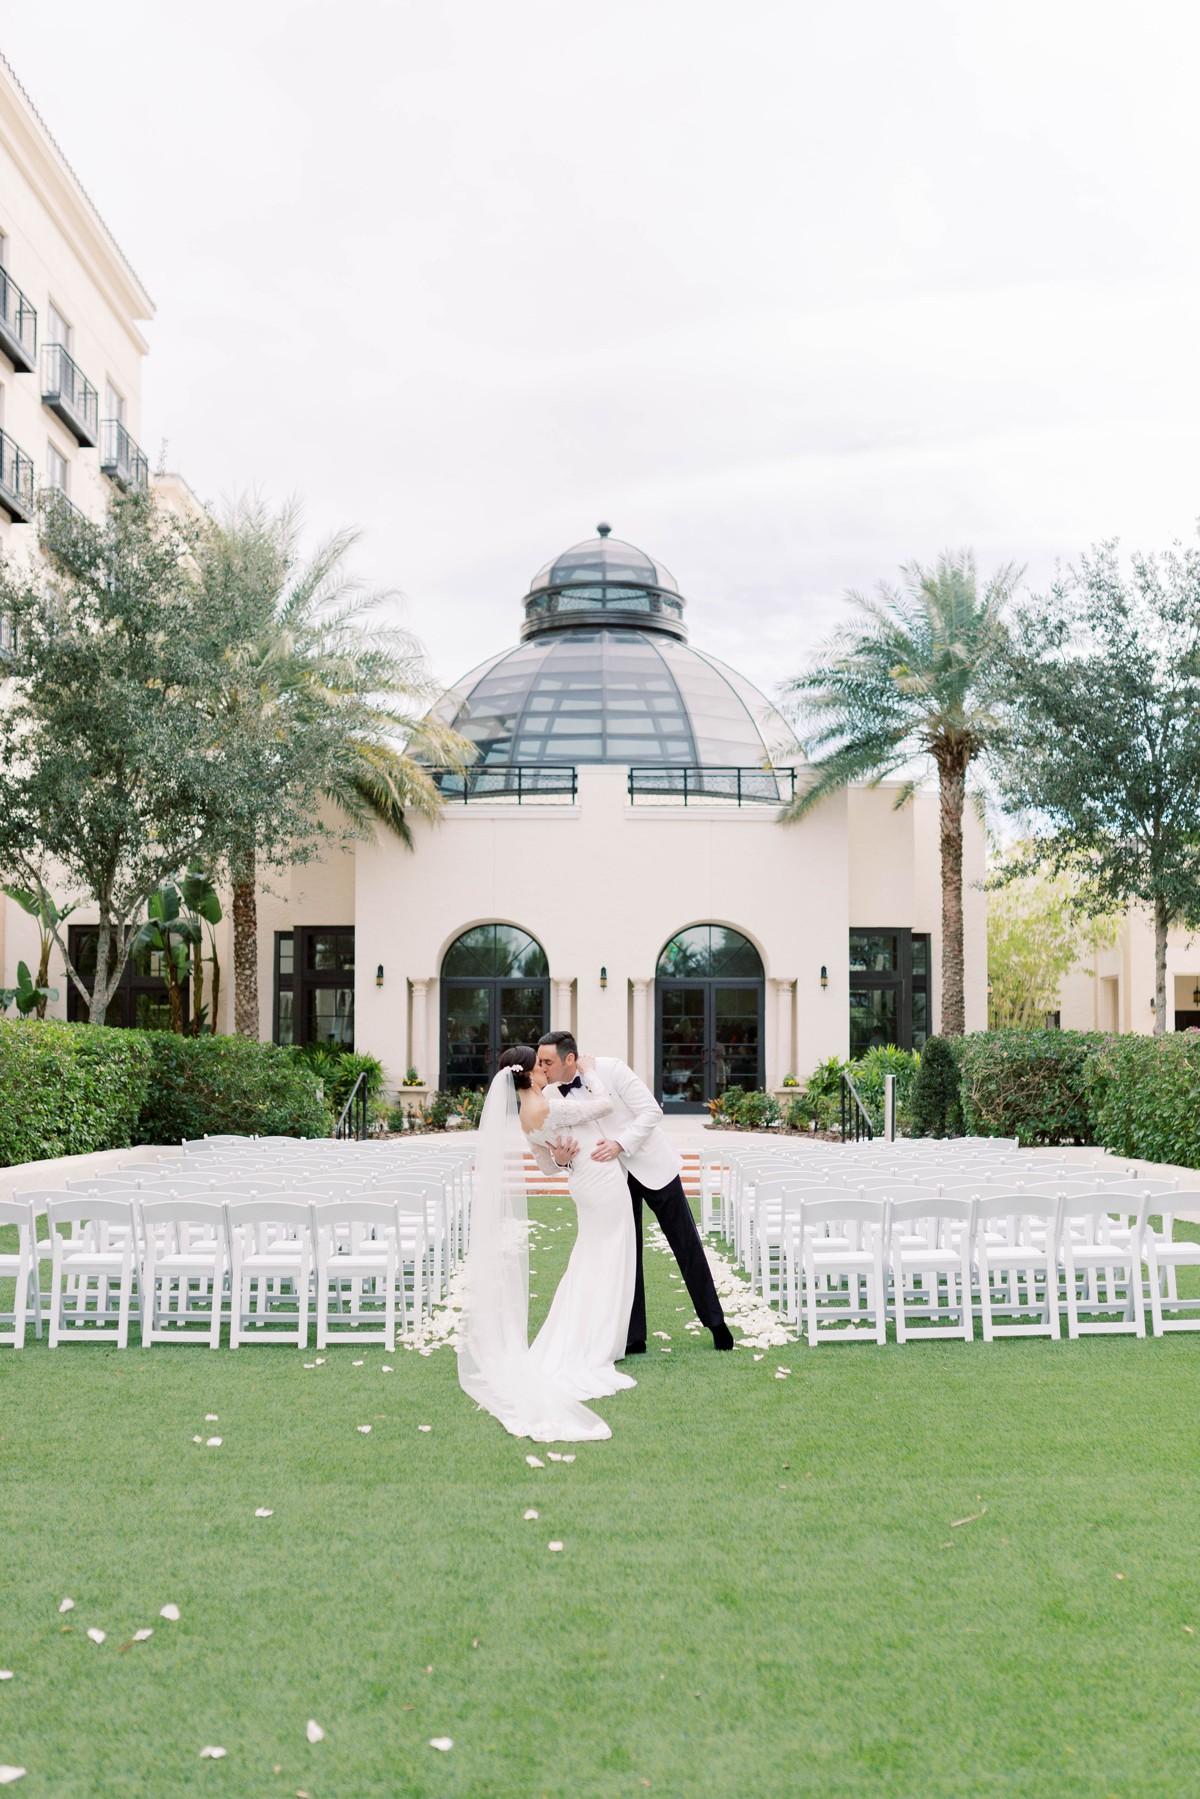 Alfond-Inn-Wedding-Winter-Park-Wedding-Photographer-Chantell-Rae-Photography_0064.jpg